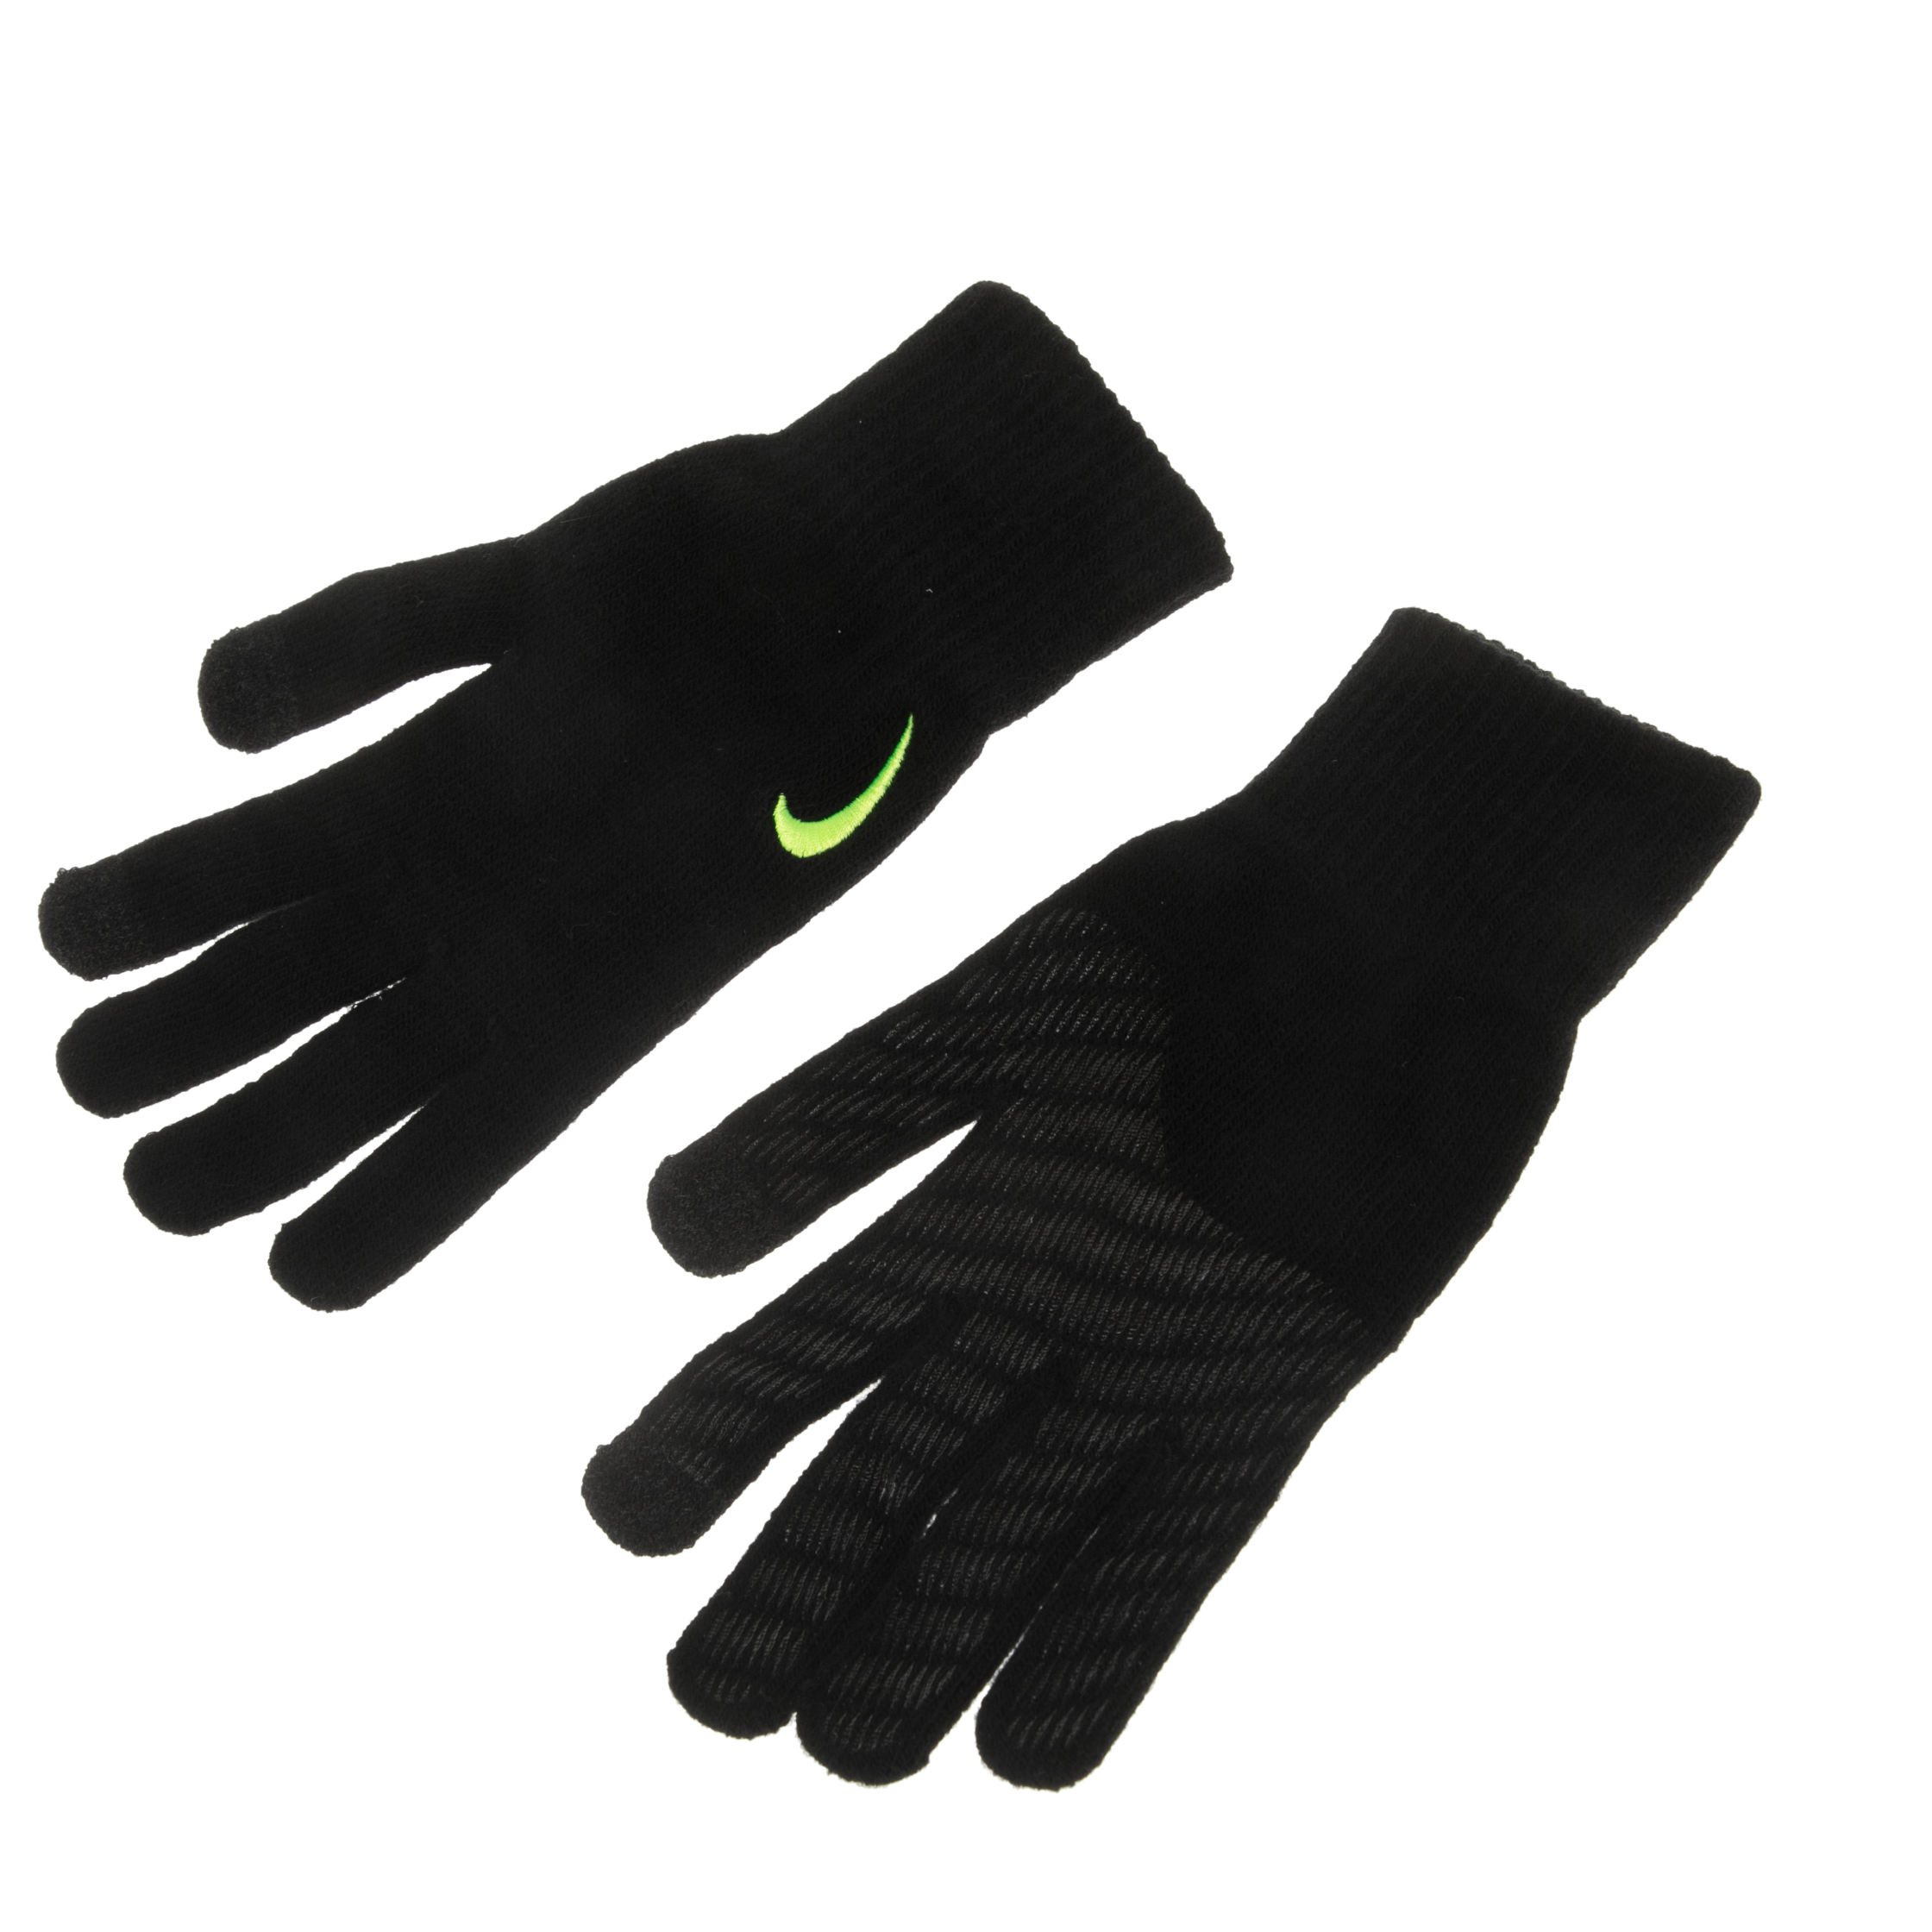 NIKE ACCESSORIES - Unisex γάντια NIKE KNITTED TECH AND GRIP μαύρα γυναικεία αξεσουάρ φουλάρια κασκόλ γάντια